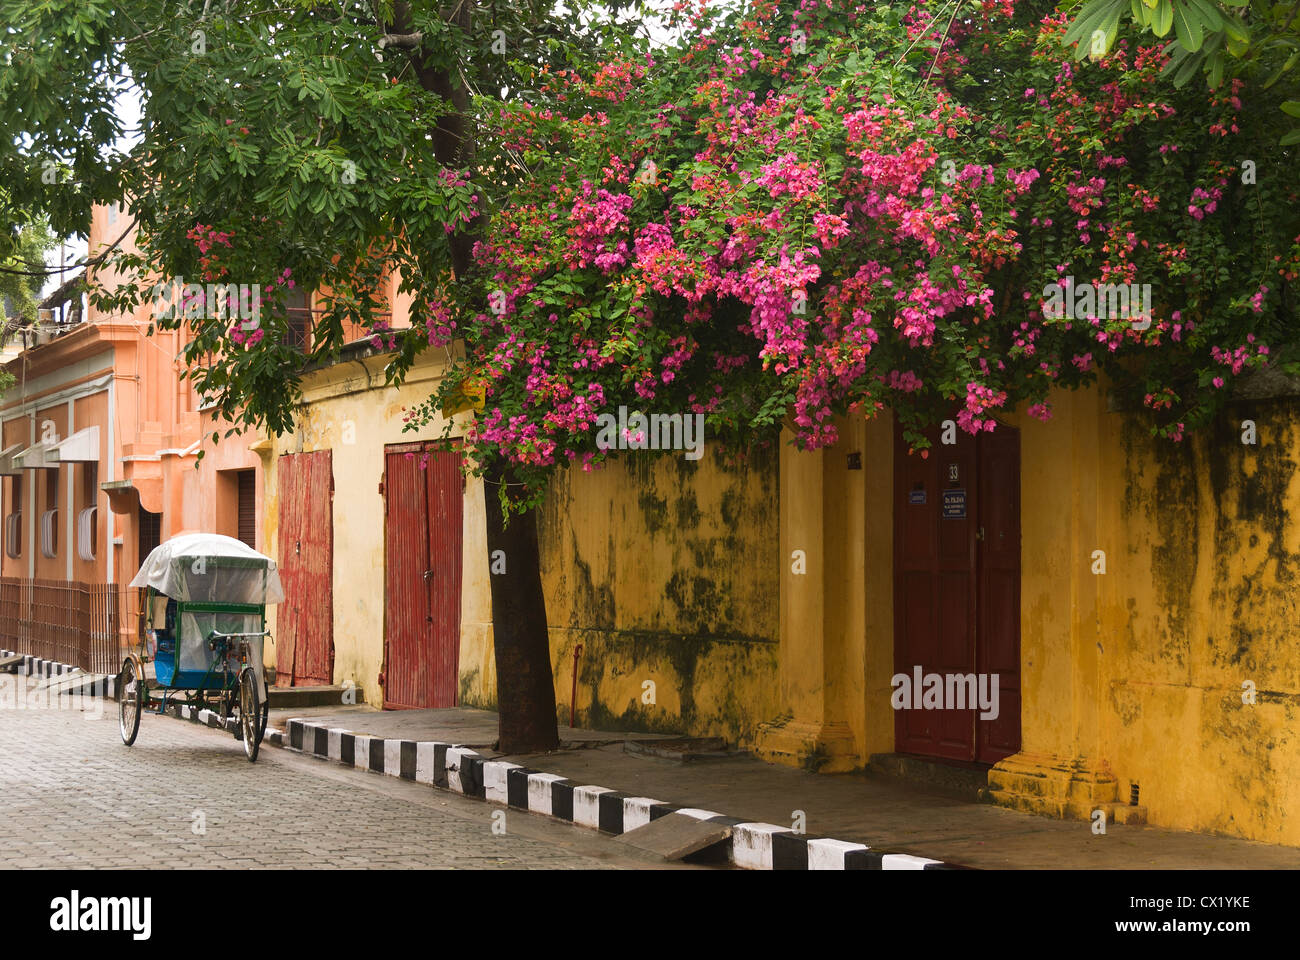 Elk201-4472 India, Tamil Nadu, Pondicherry, French Quarter, street scene with cycle rickshaw - Stock Image